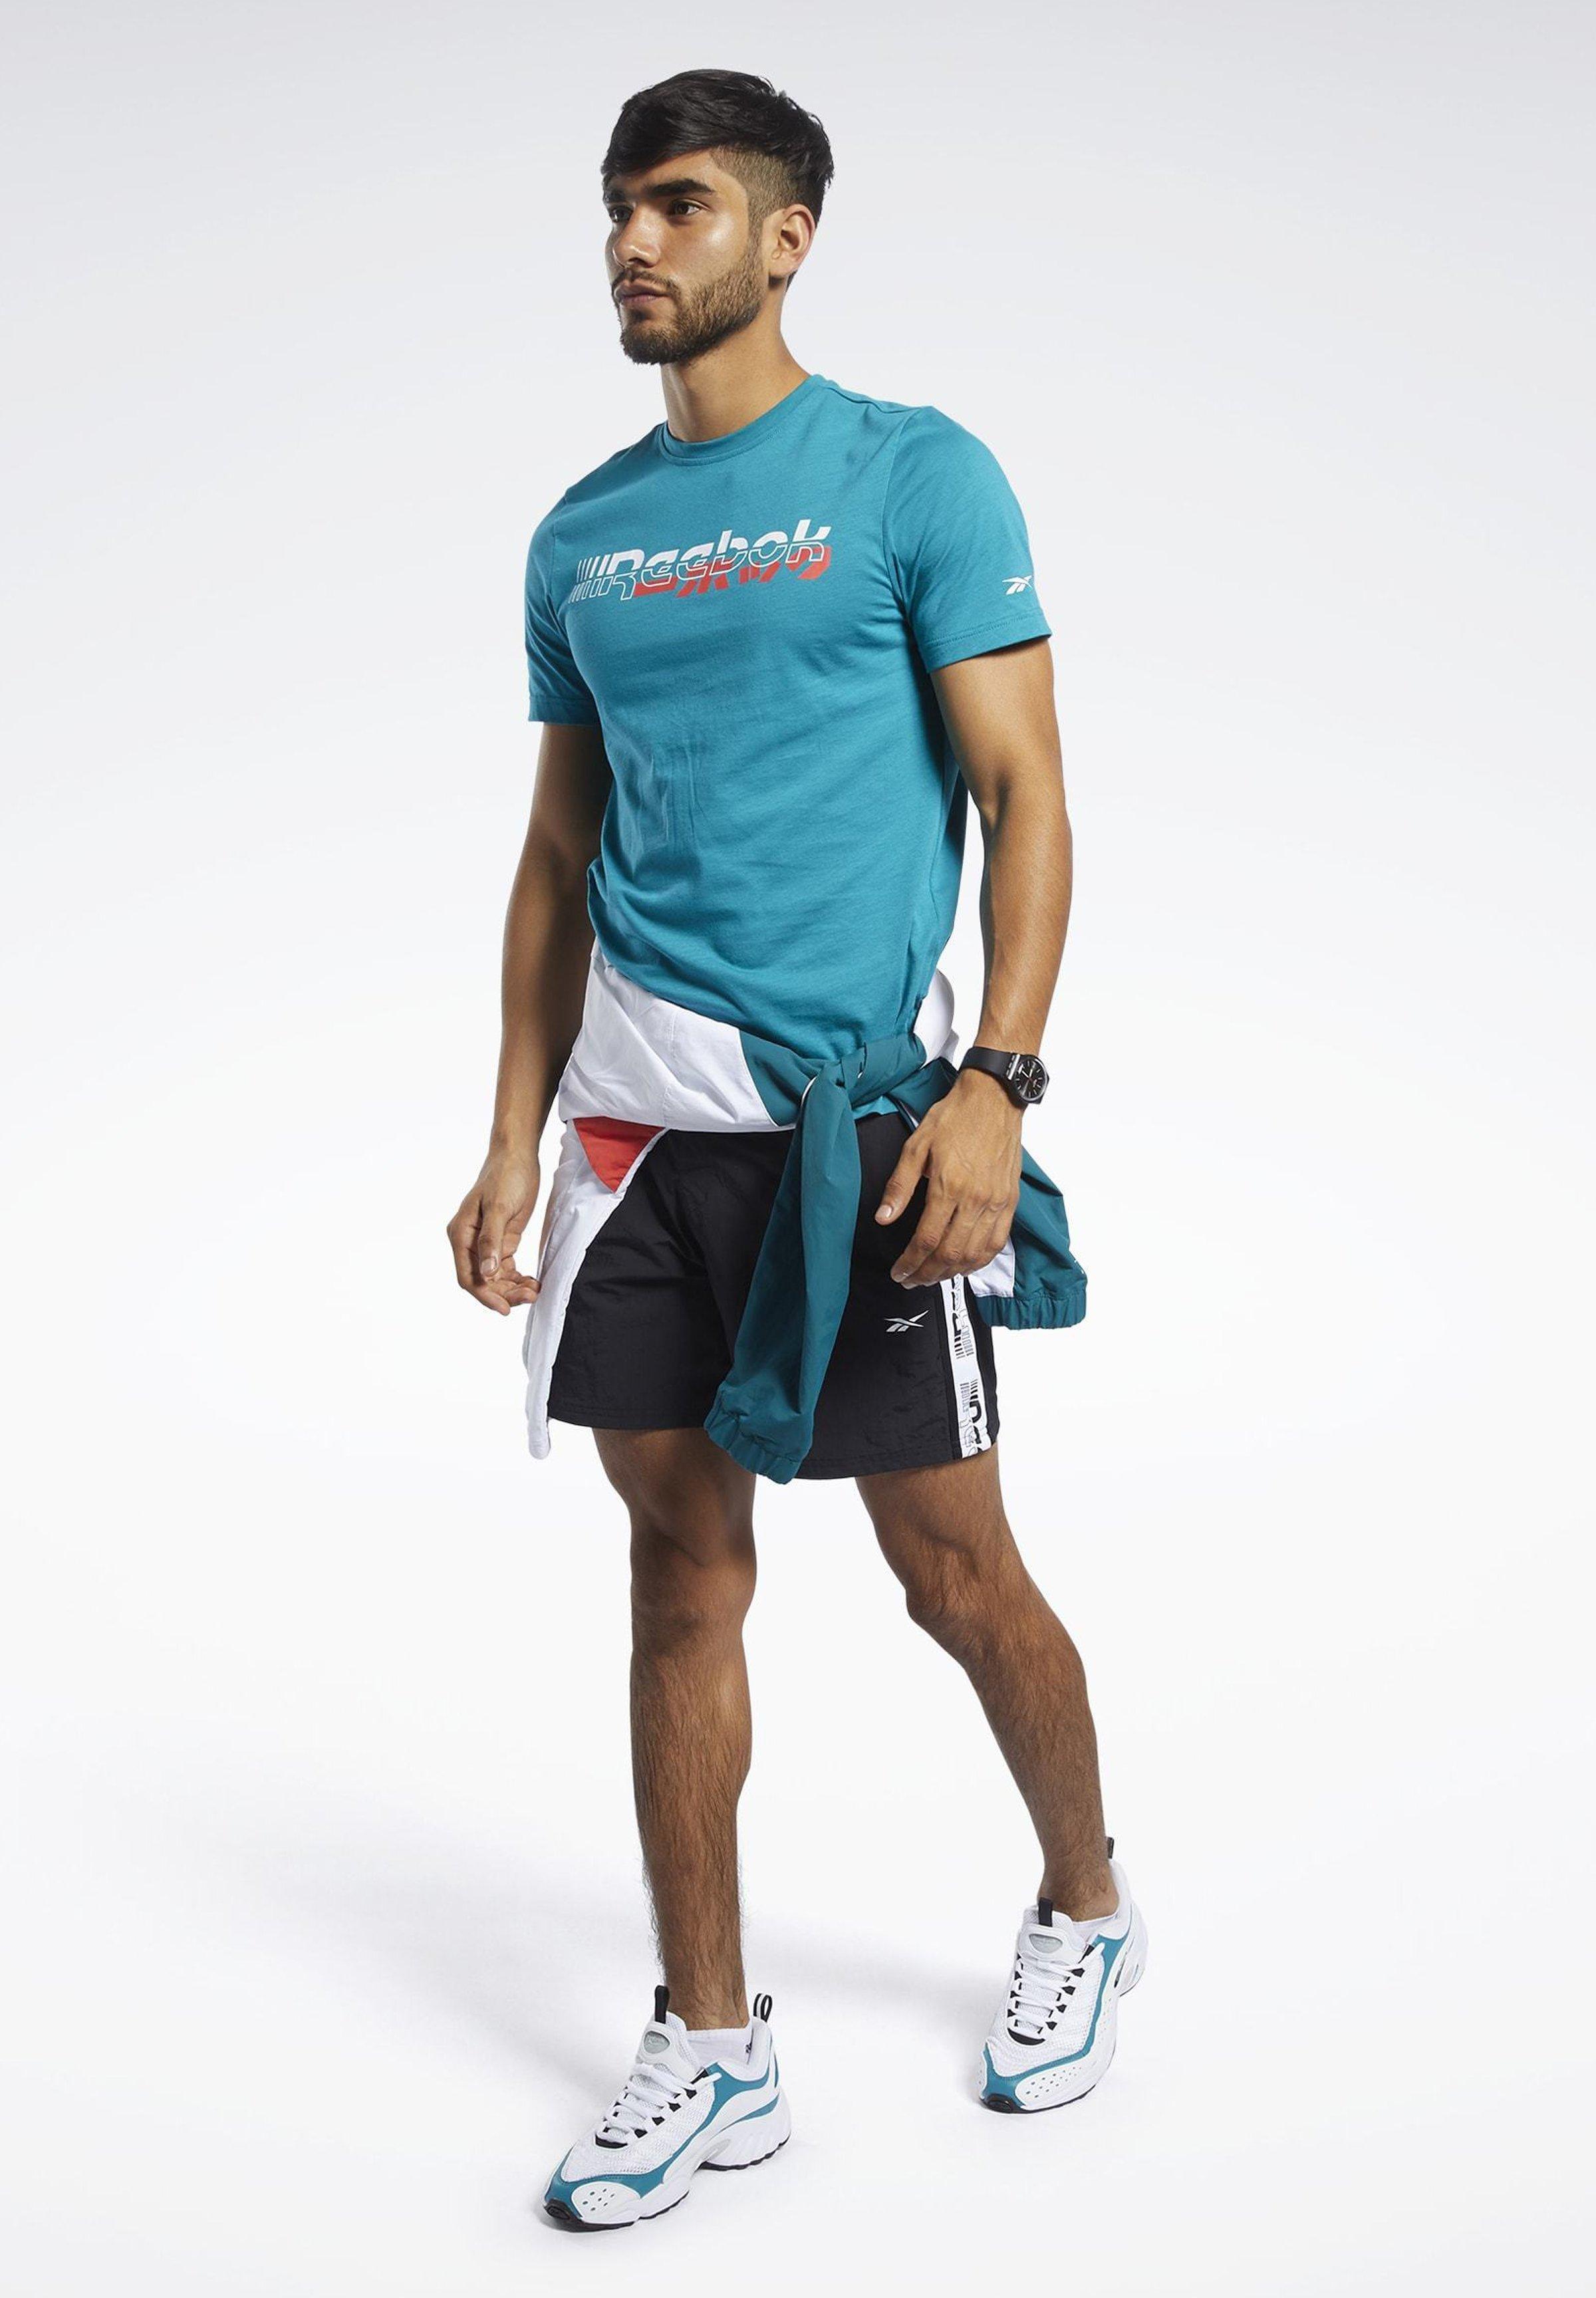 Reebok Meet You There Tee - T-shirt Imprimé Seaport Teal